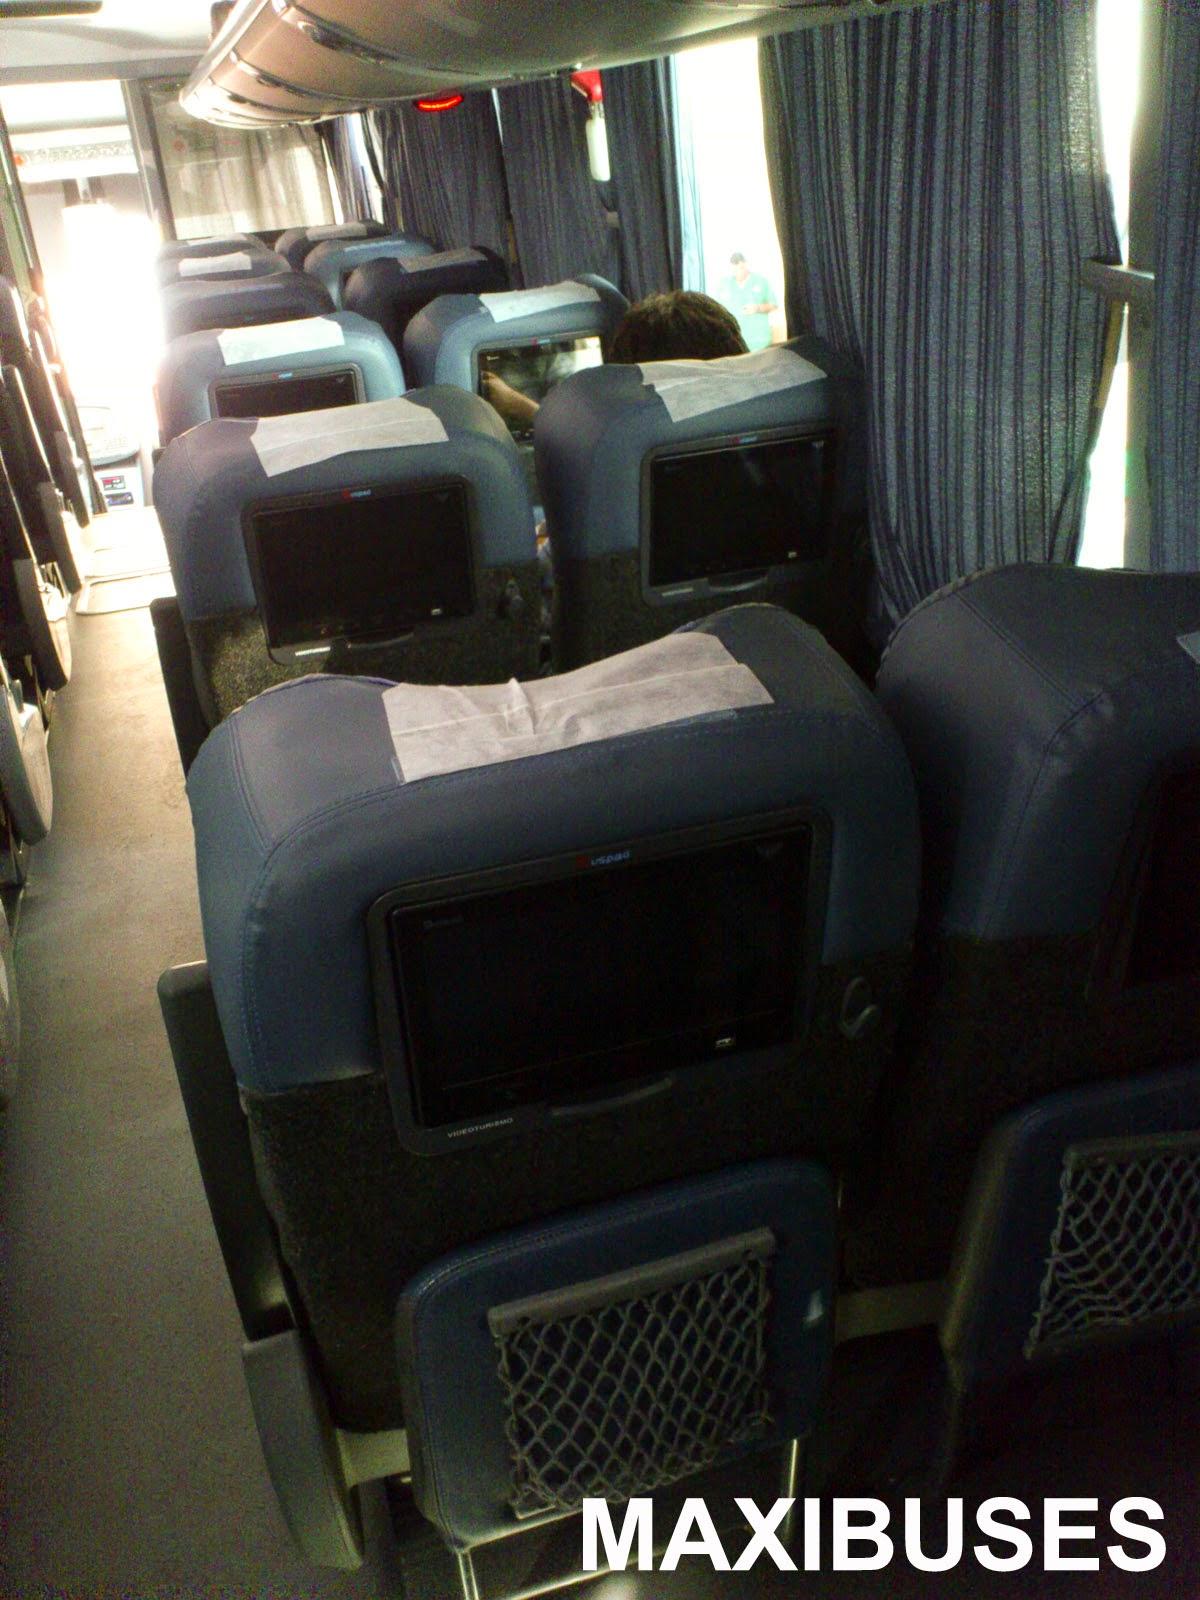 Maxibuses especial autobuses futura select - Cuanto gana un disenador de interiores ...